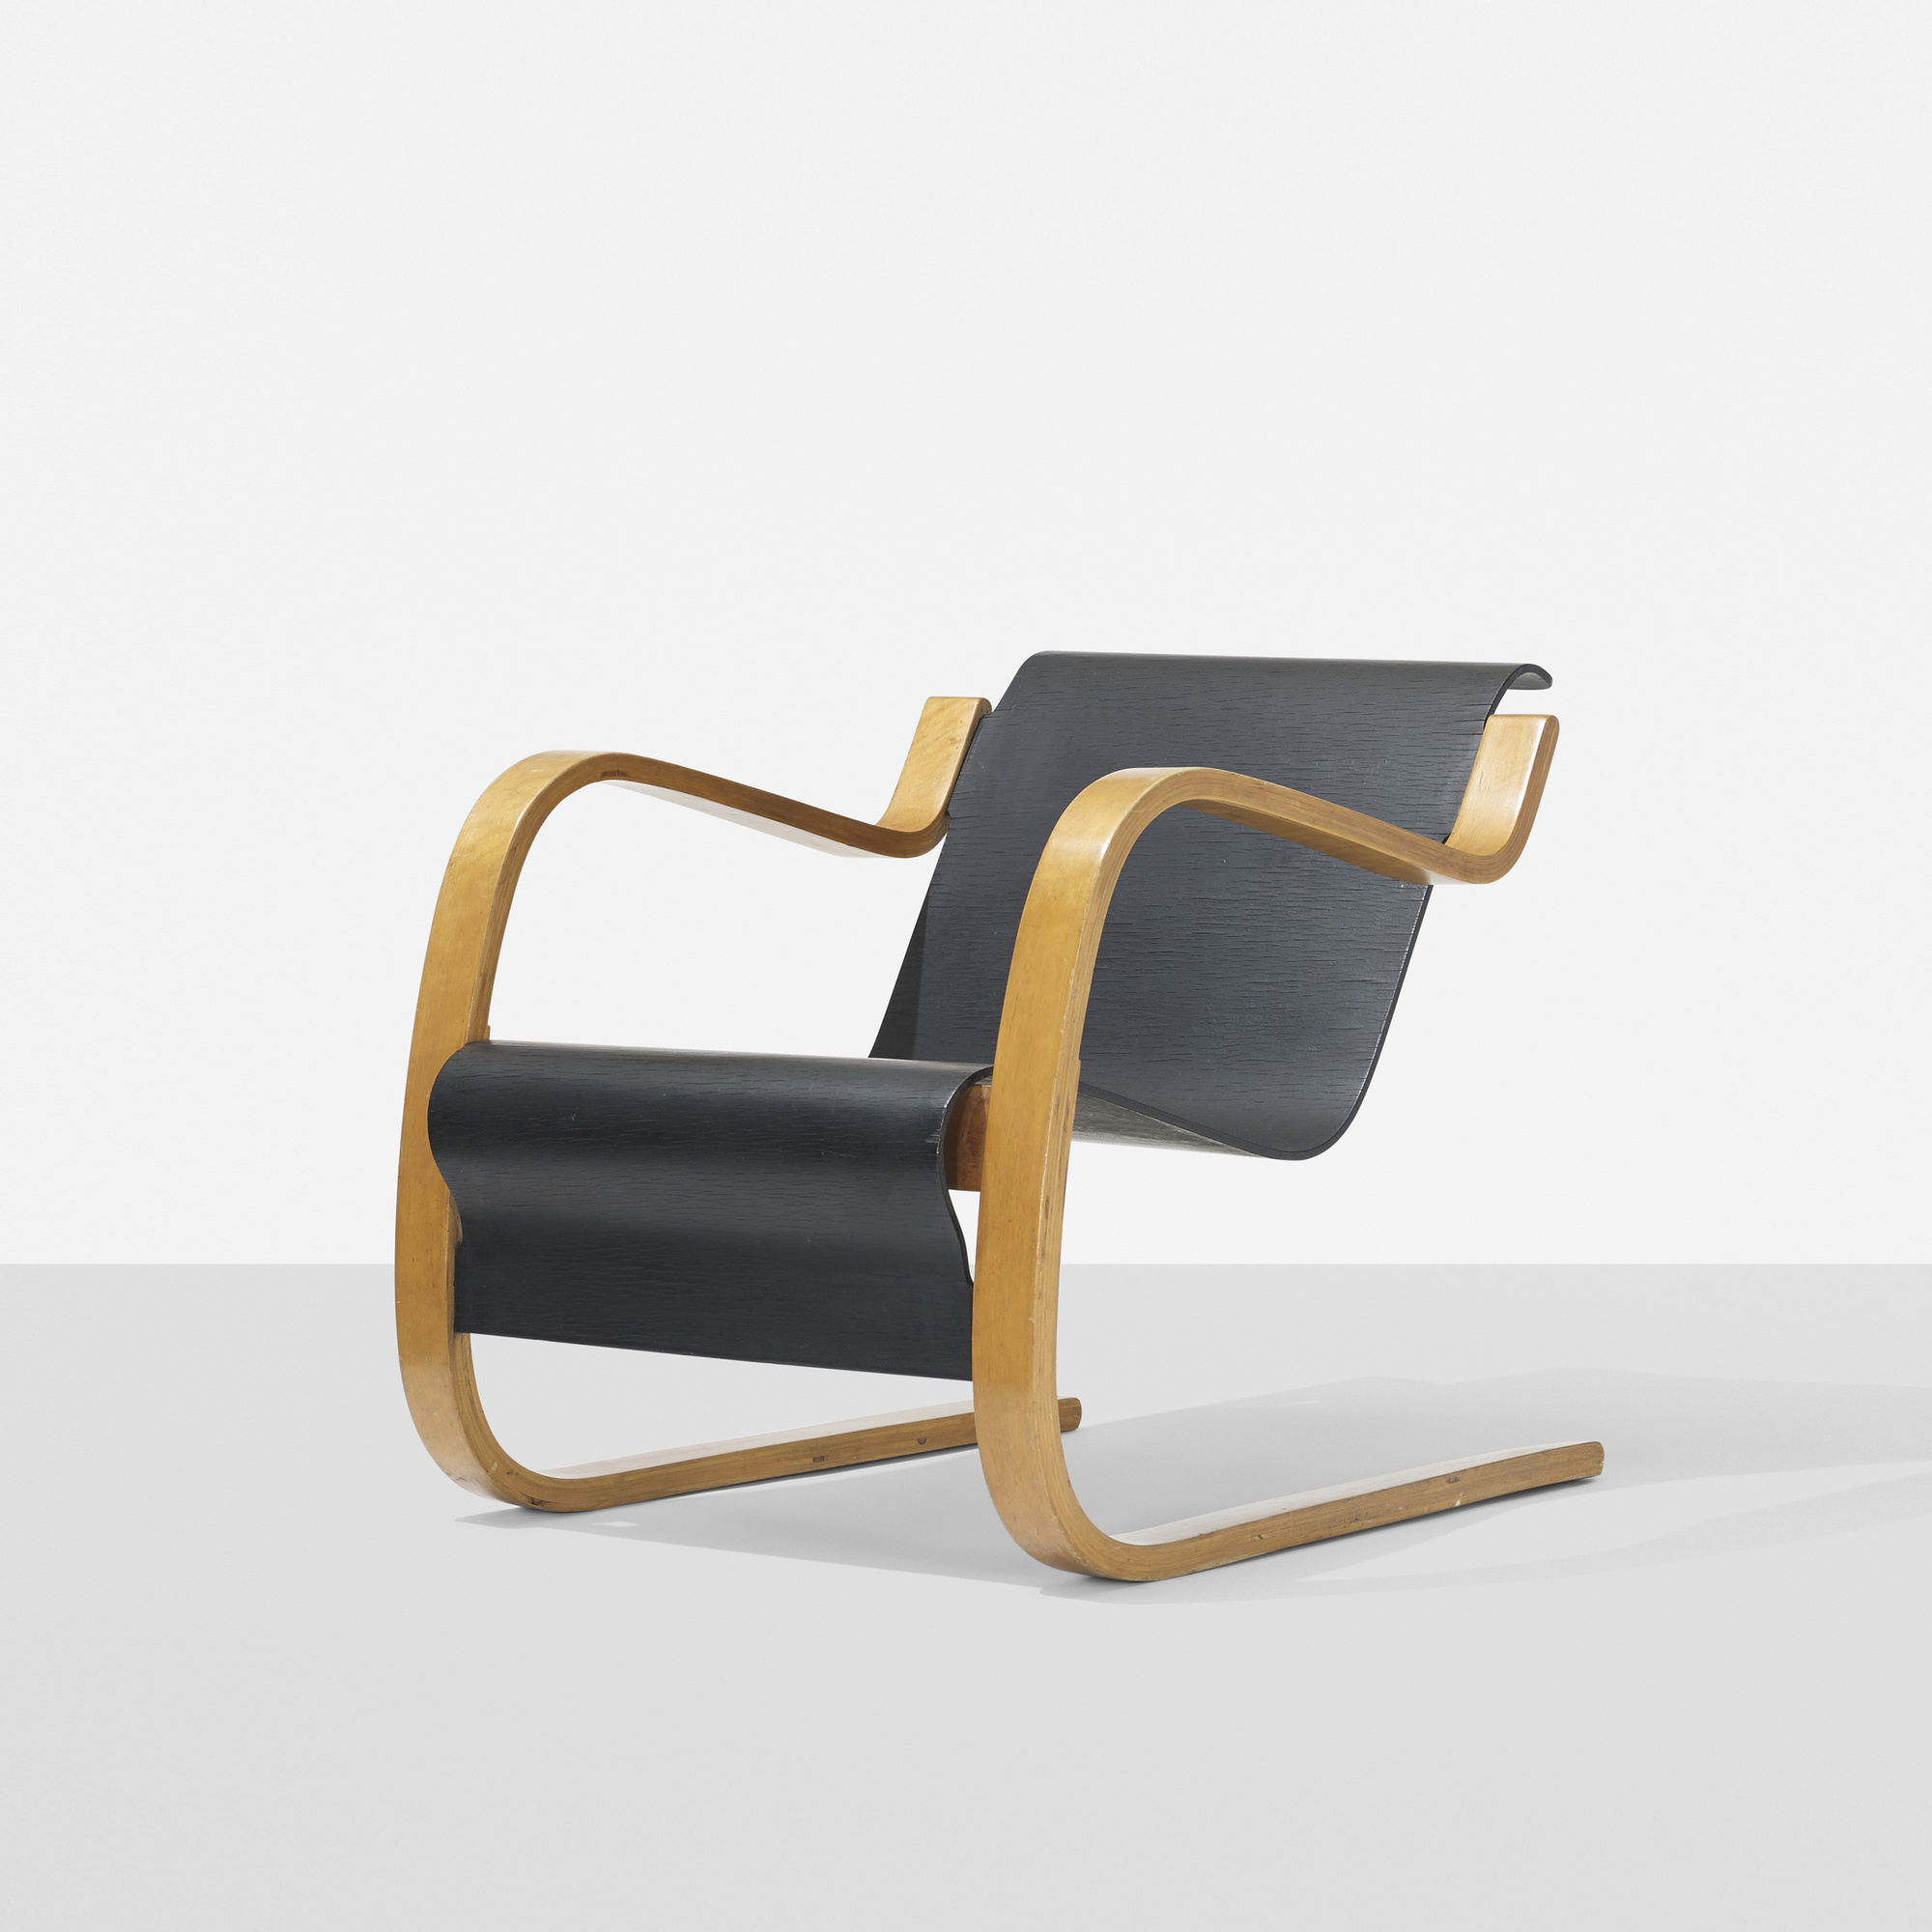 204 ALVAR AALTO, Cantilever lounge chair, model 31 42